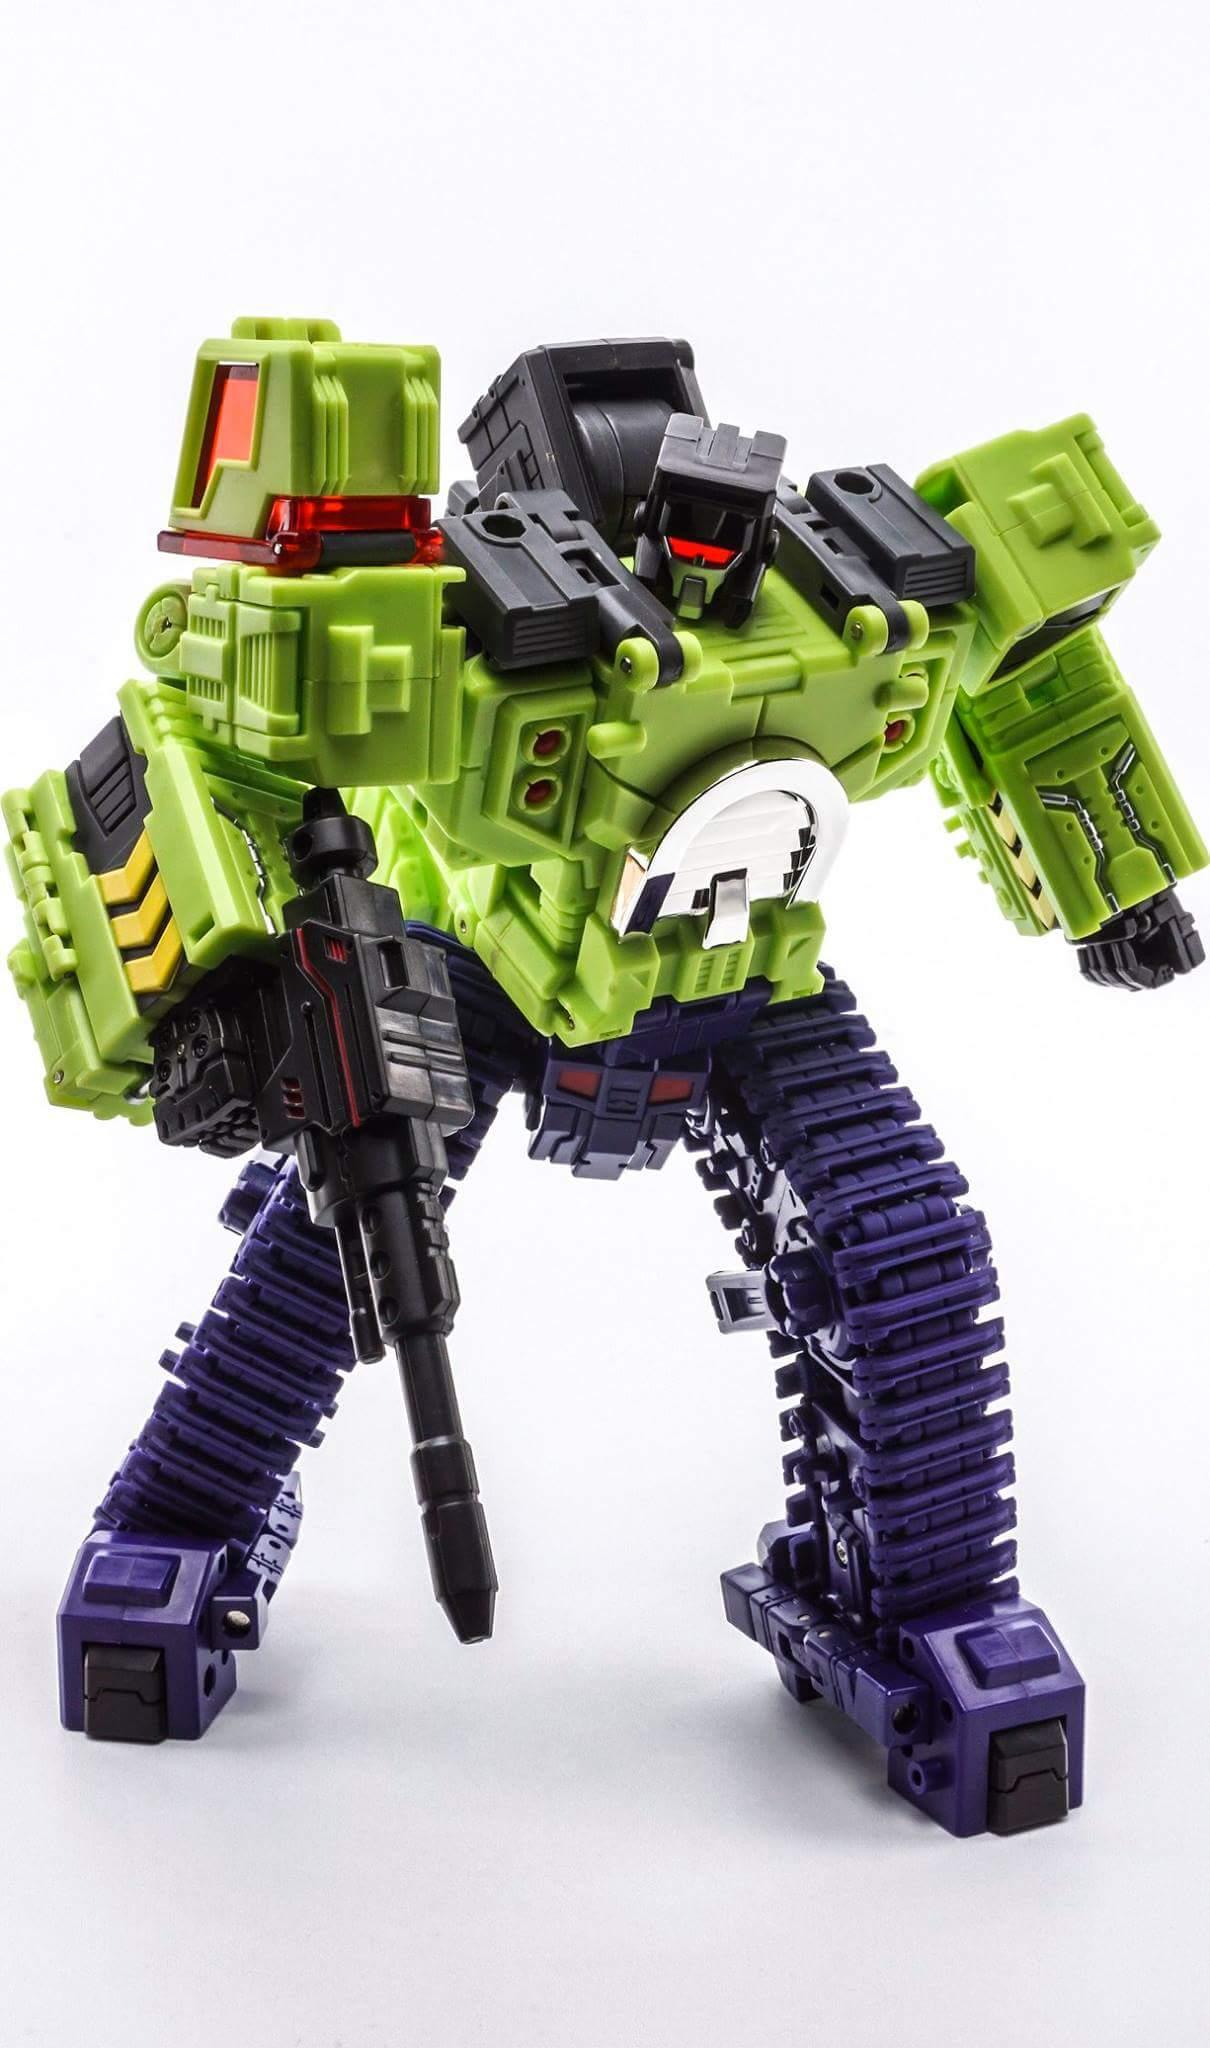 [Toyworld] Produit Tiers - Jouet TW-C Constructor aka Devastator/Dévastateur (Version vert G1 et jaune G2) - Page 2 Iky3SC3q